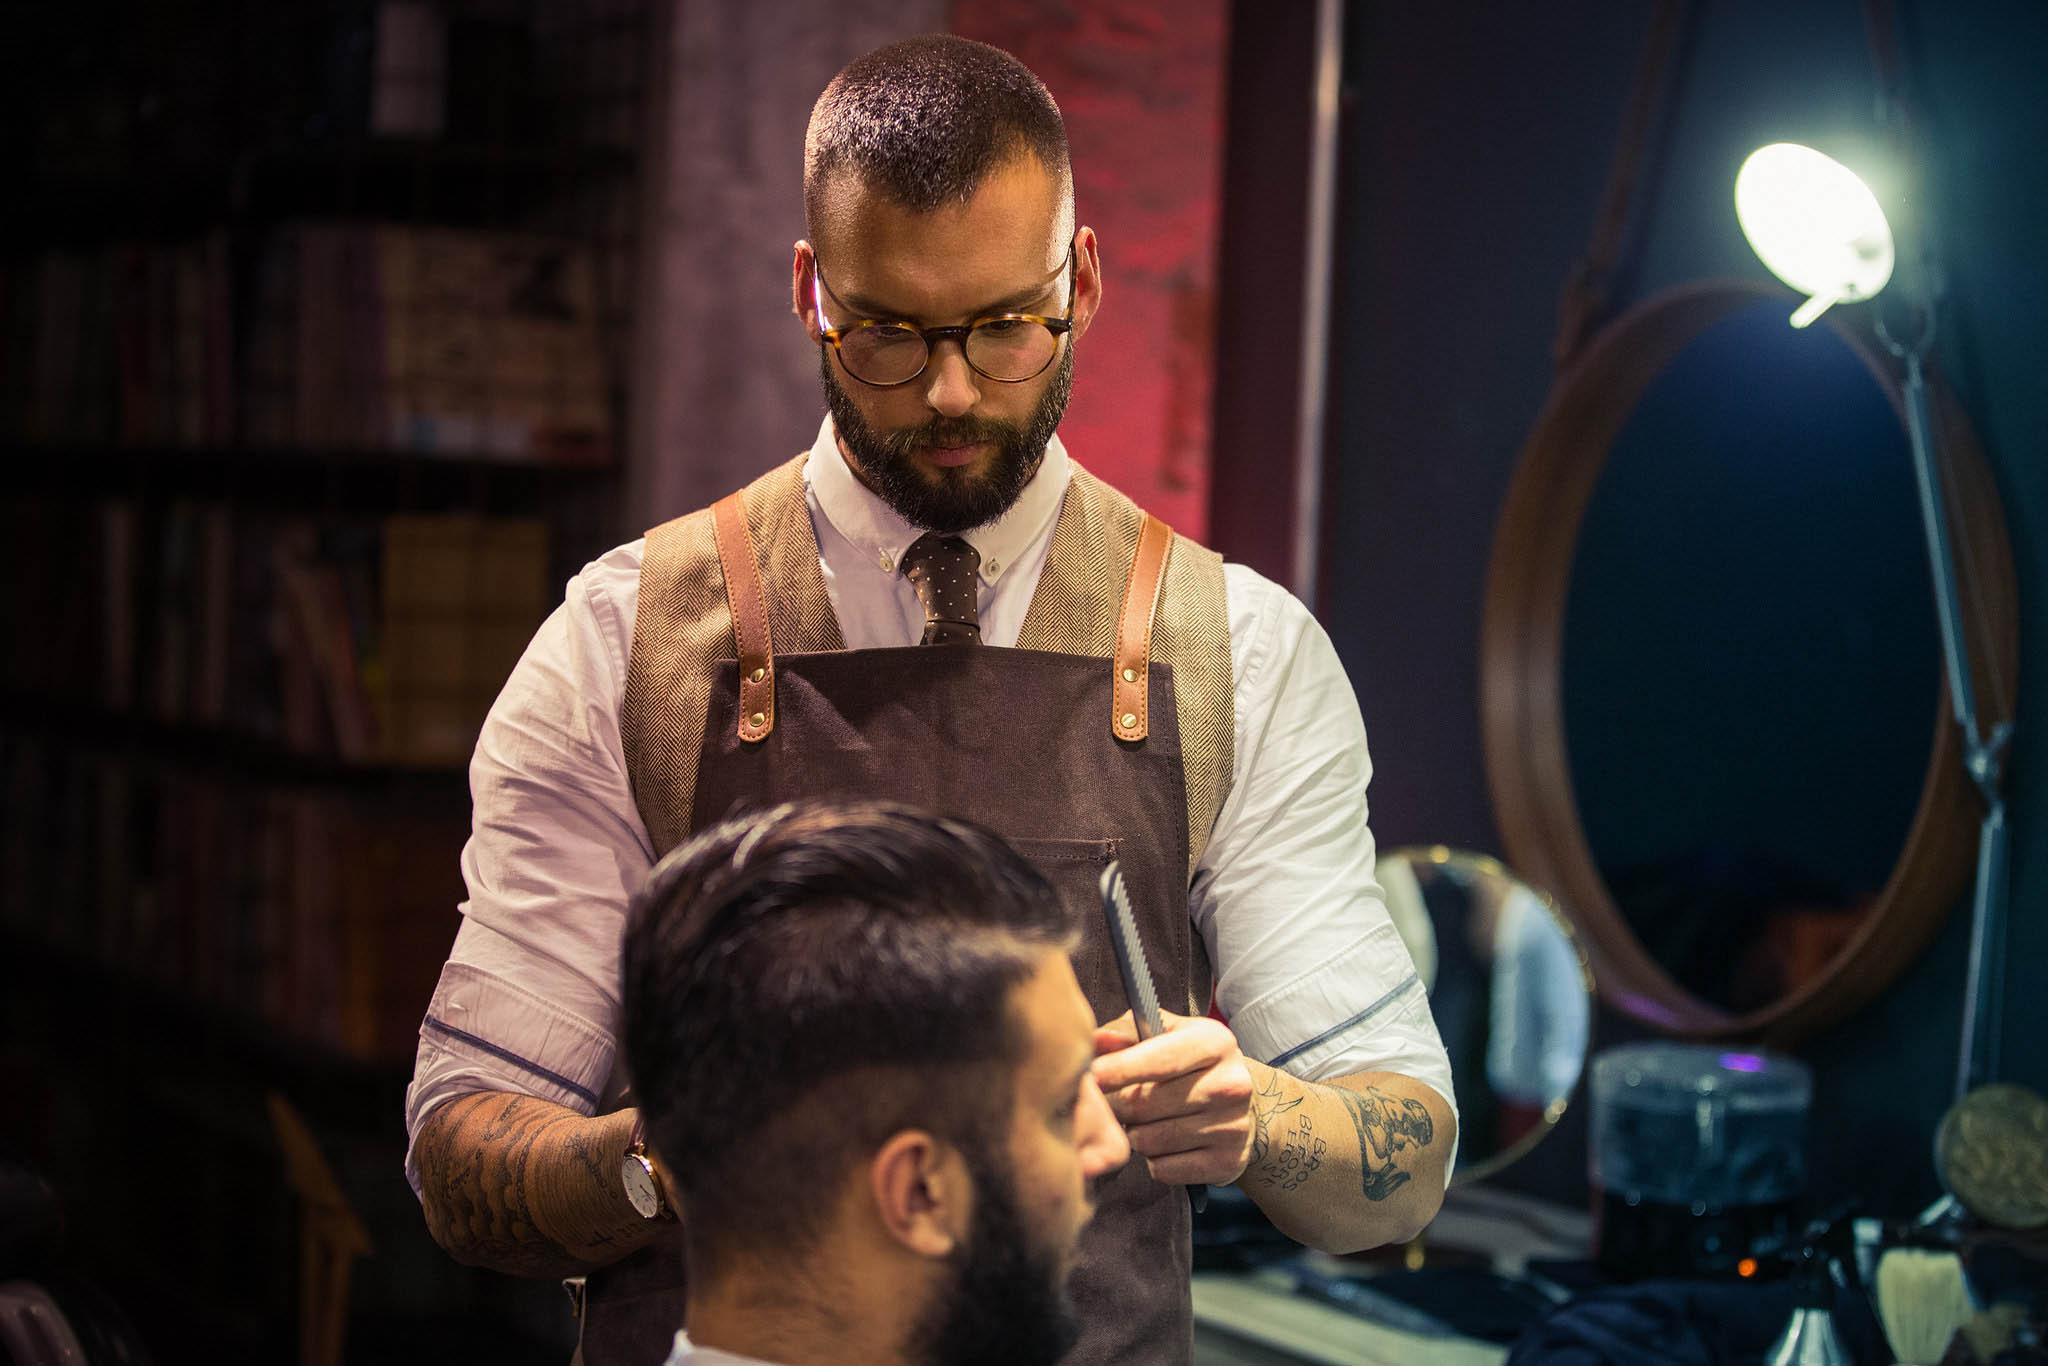 legends frankfurt bar club barber friseur patrick schmetzer